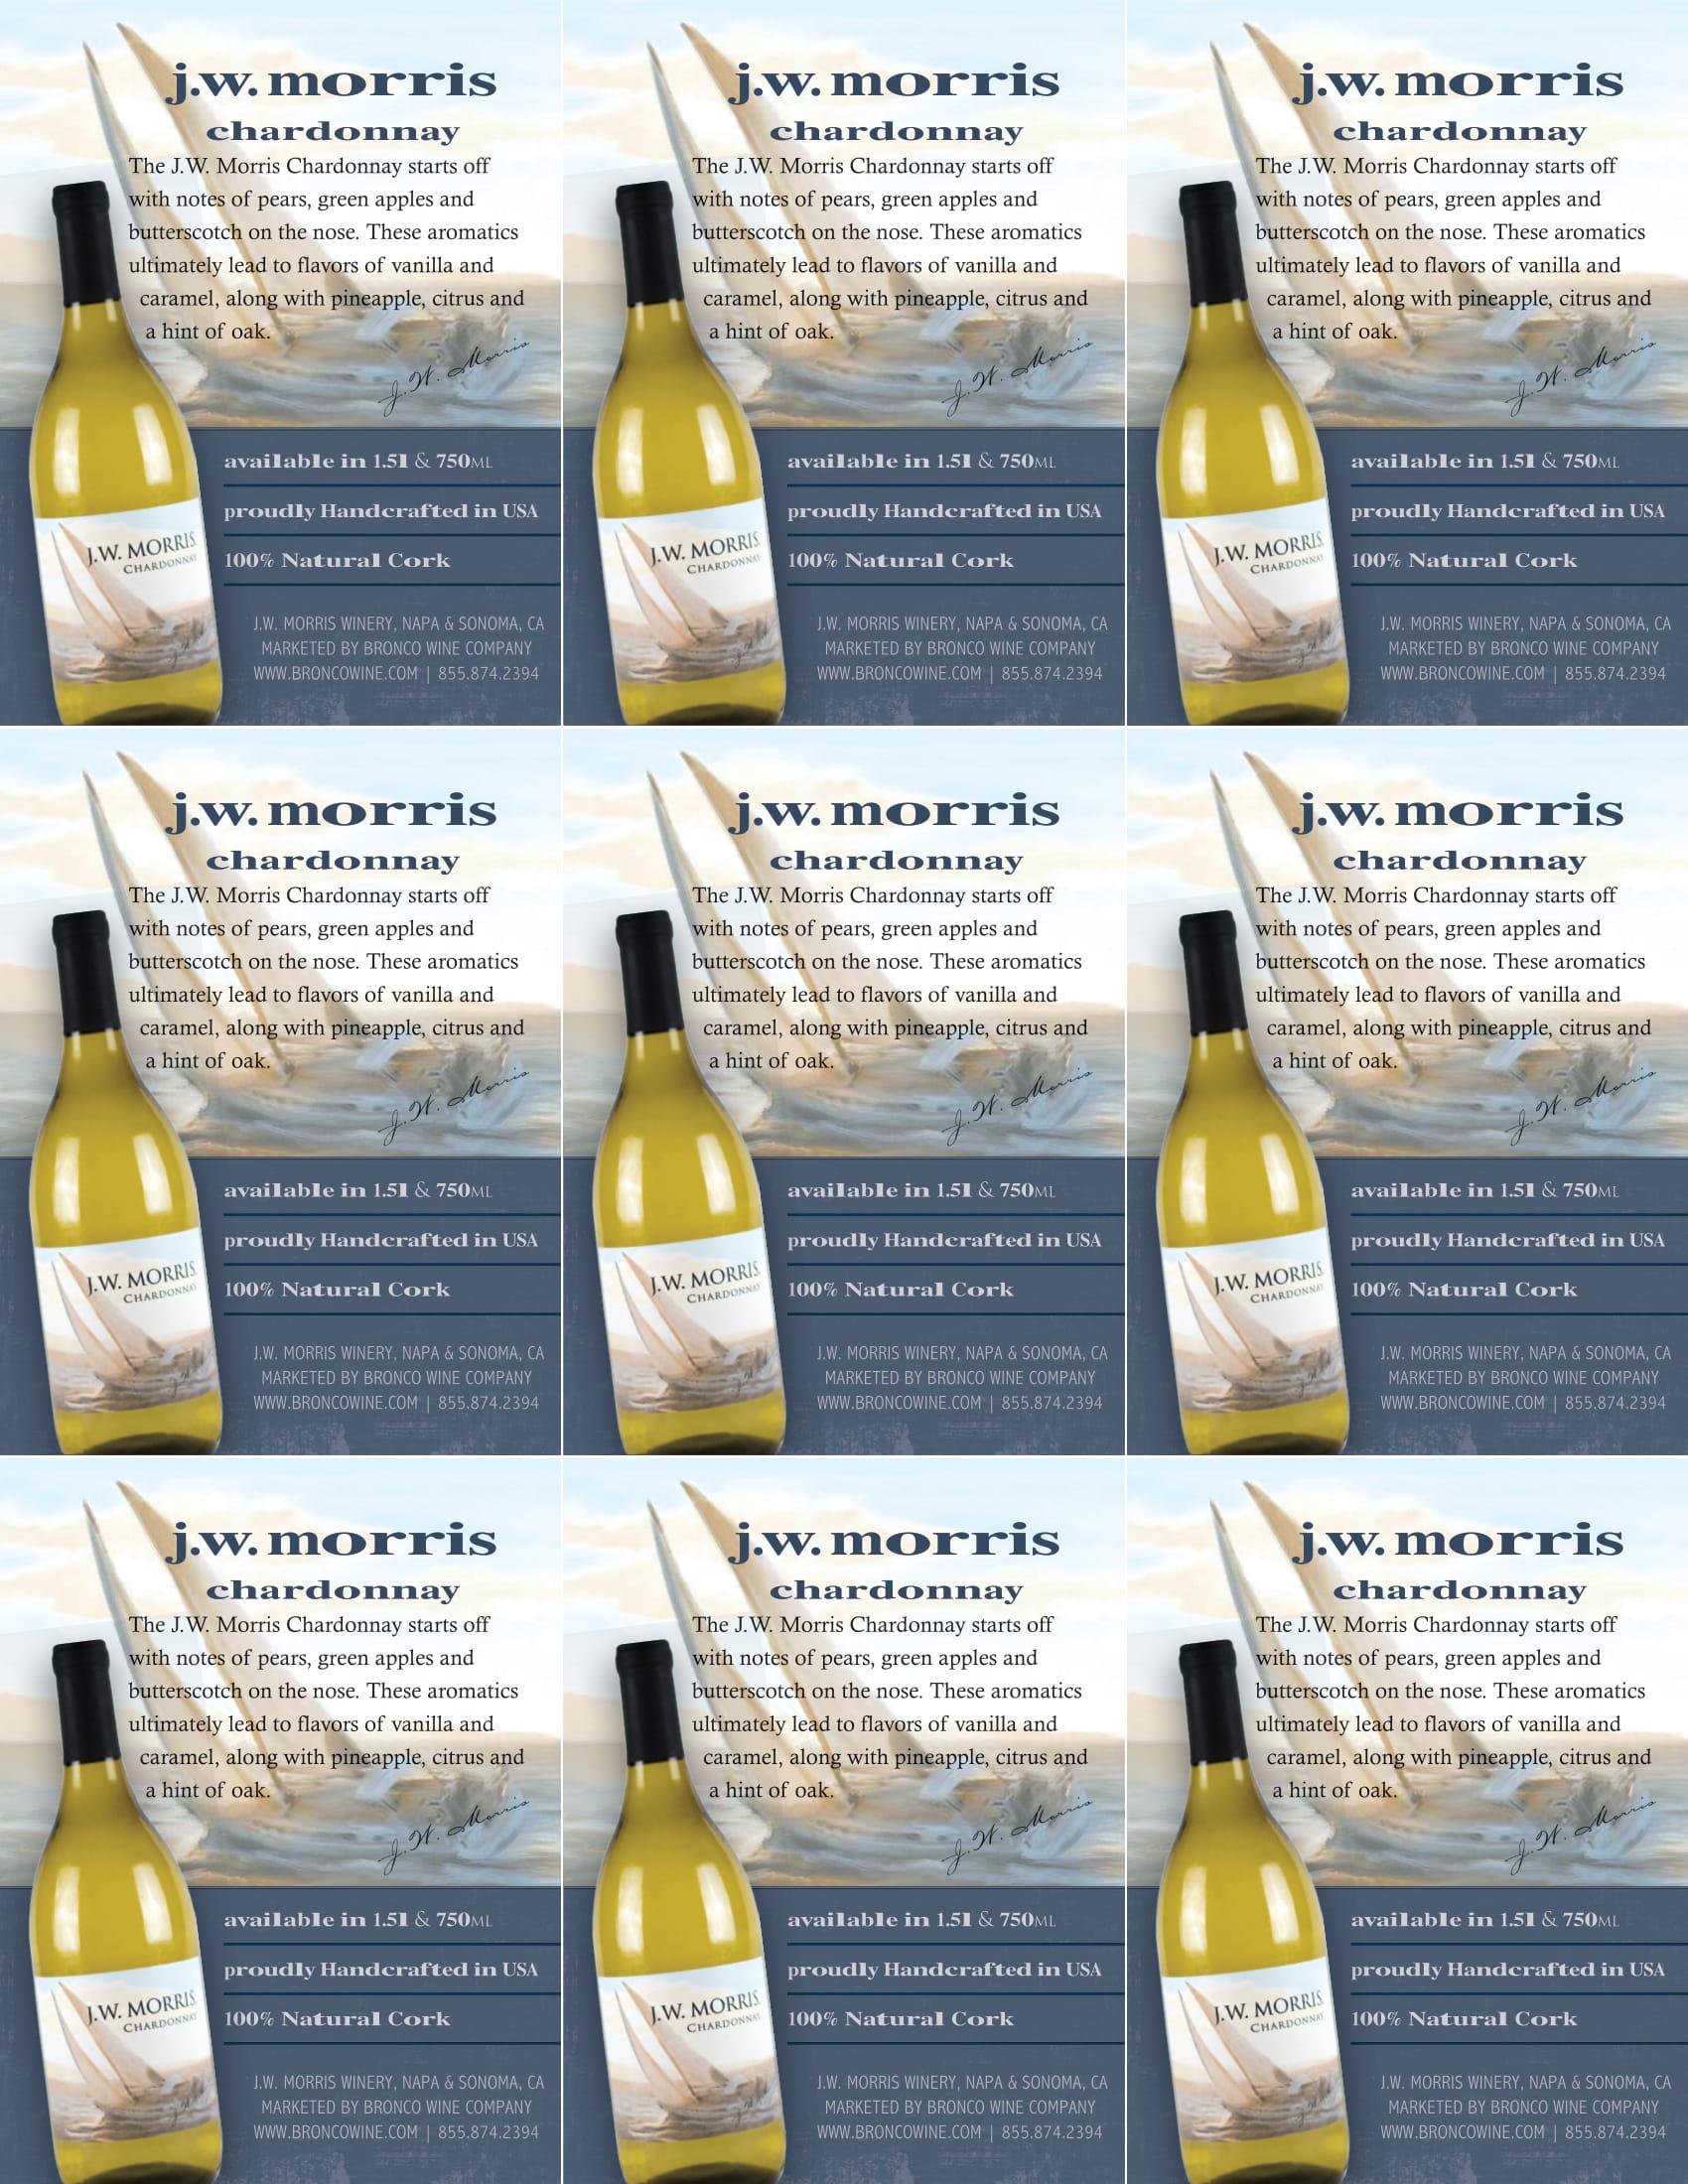 JW Morris Chardonnay Shelf Talkers